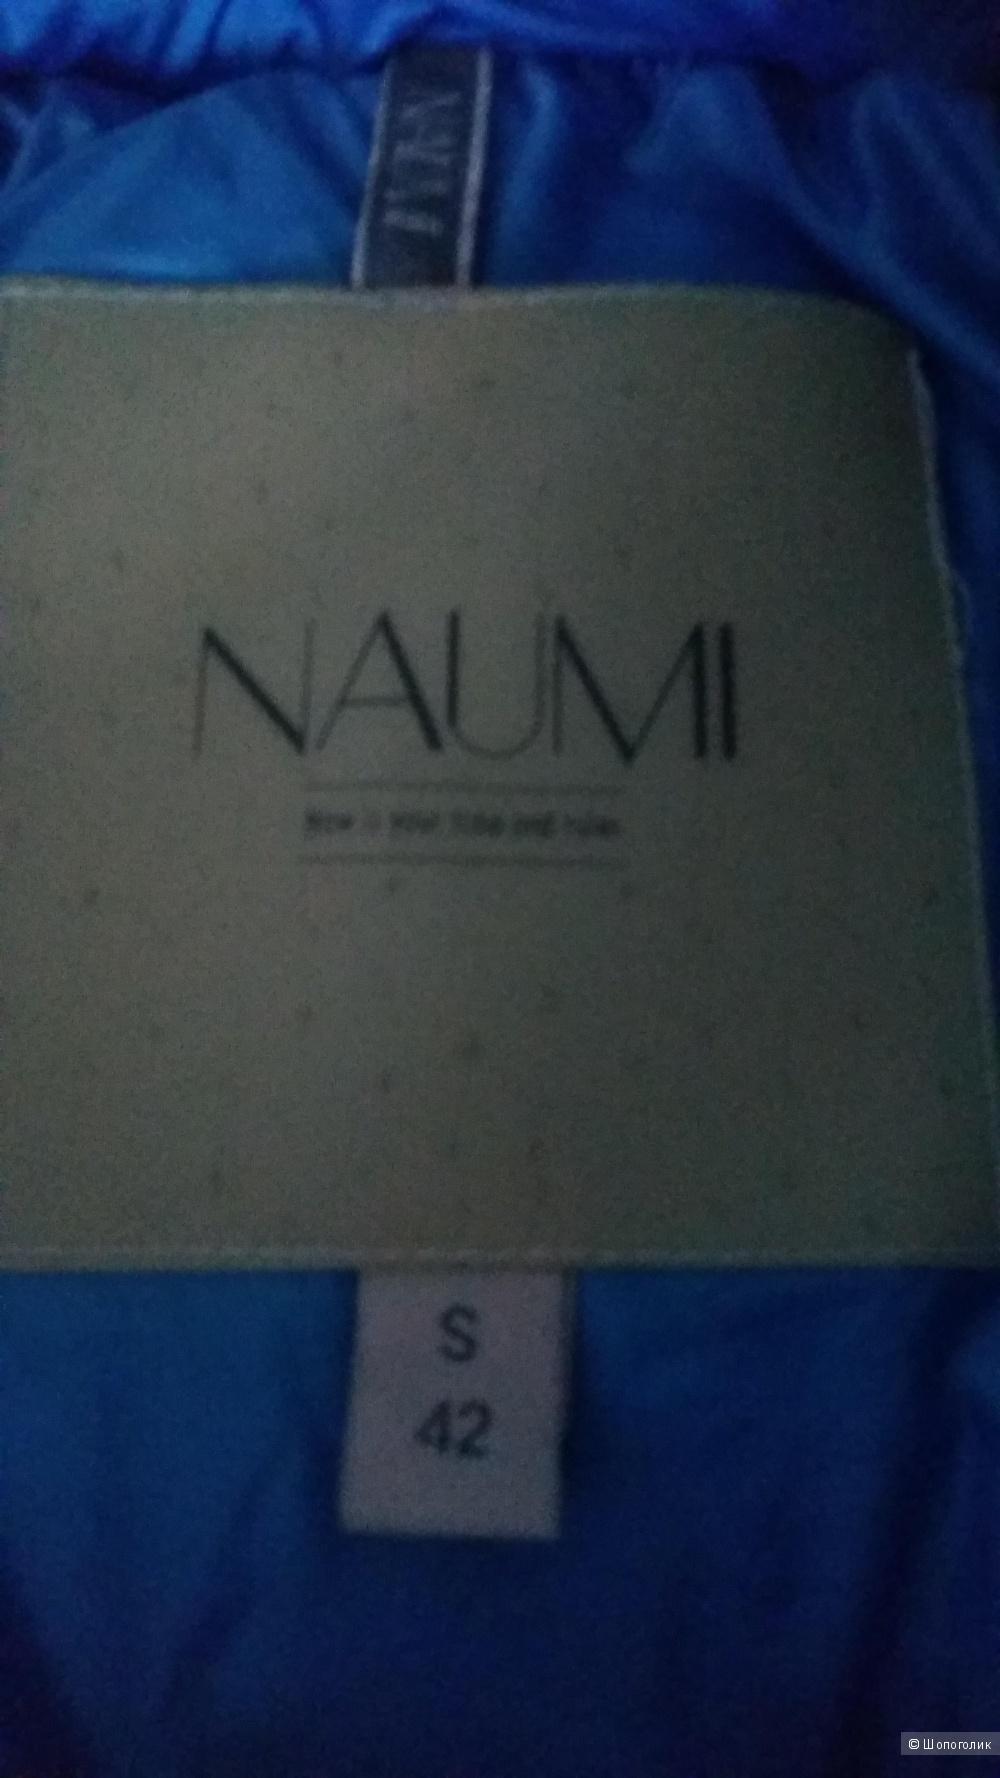 Пуховик Naumi р. 42